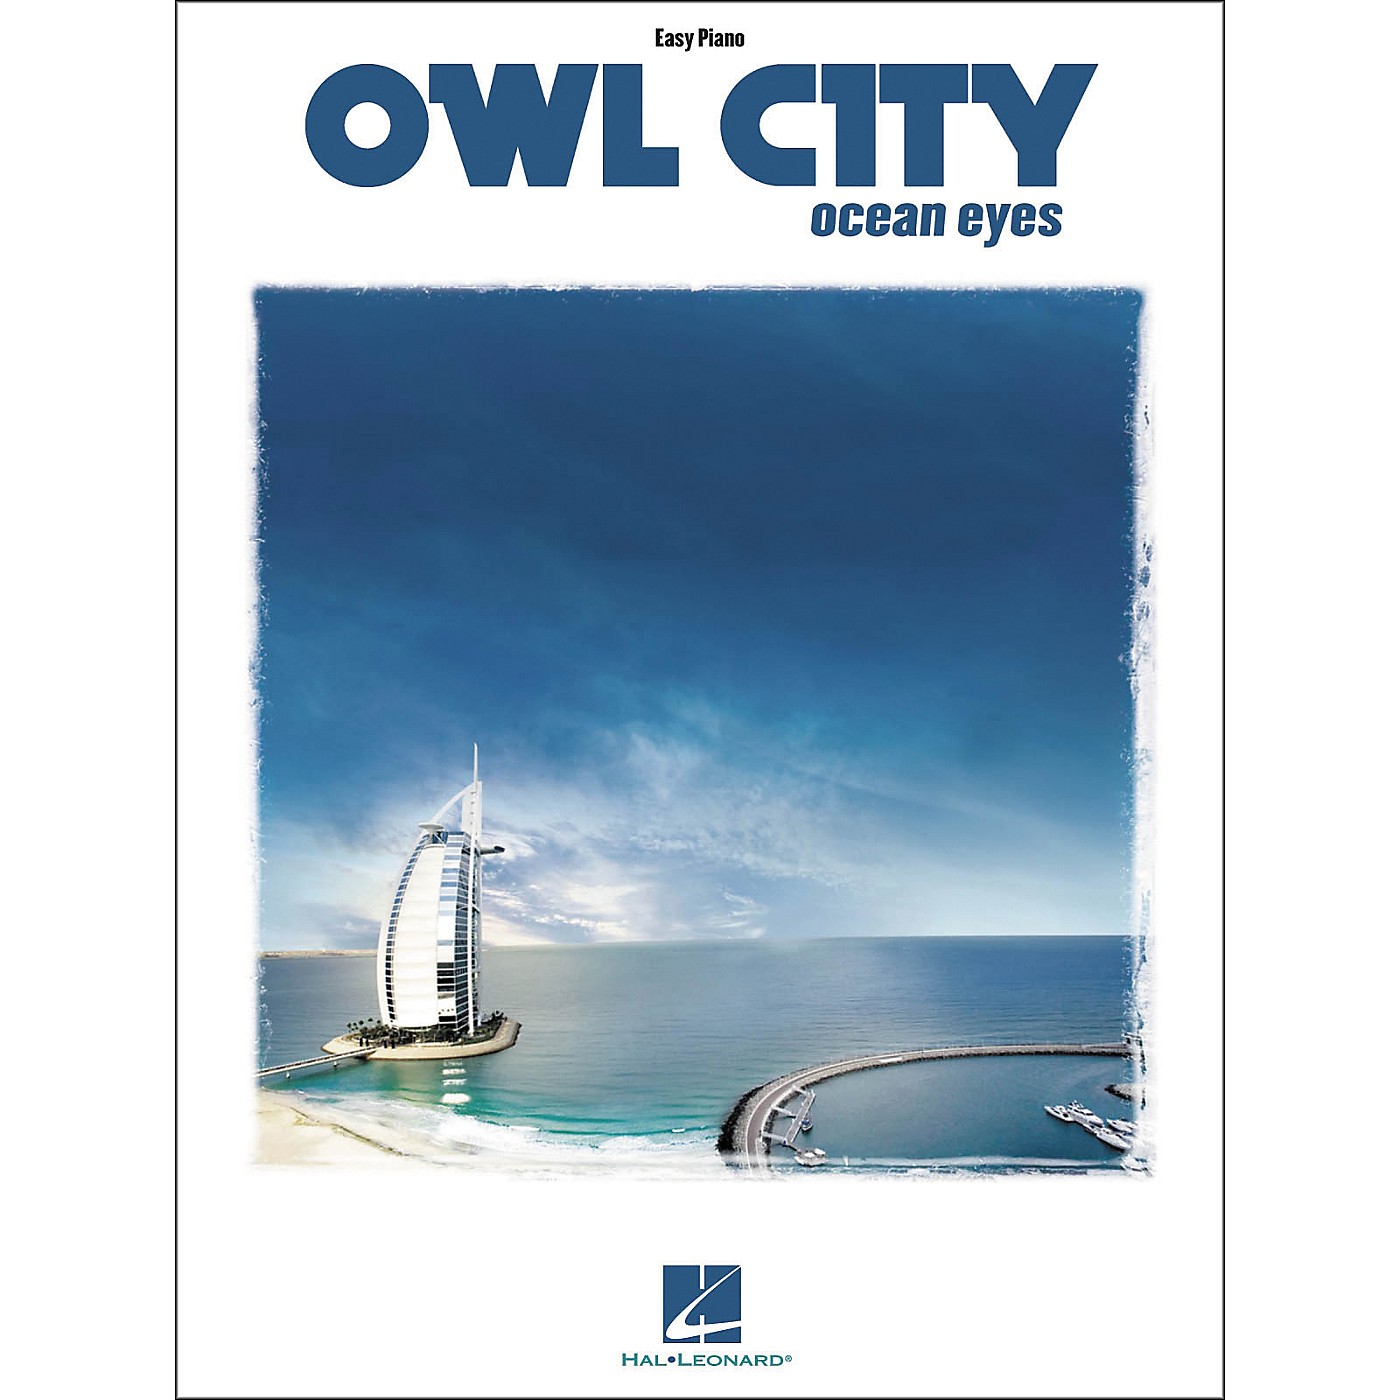 Hal Leonard Owl City - Ocean Eyes For Easy Piano Songbook thumbnail